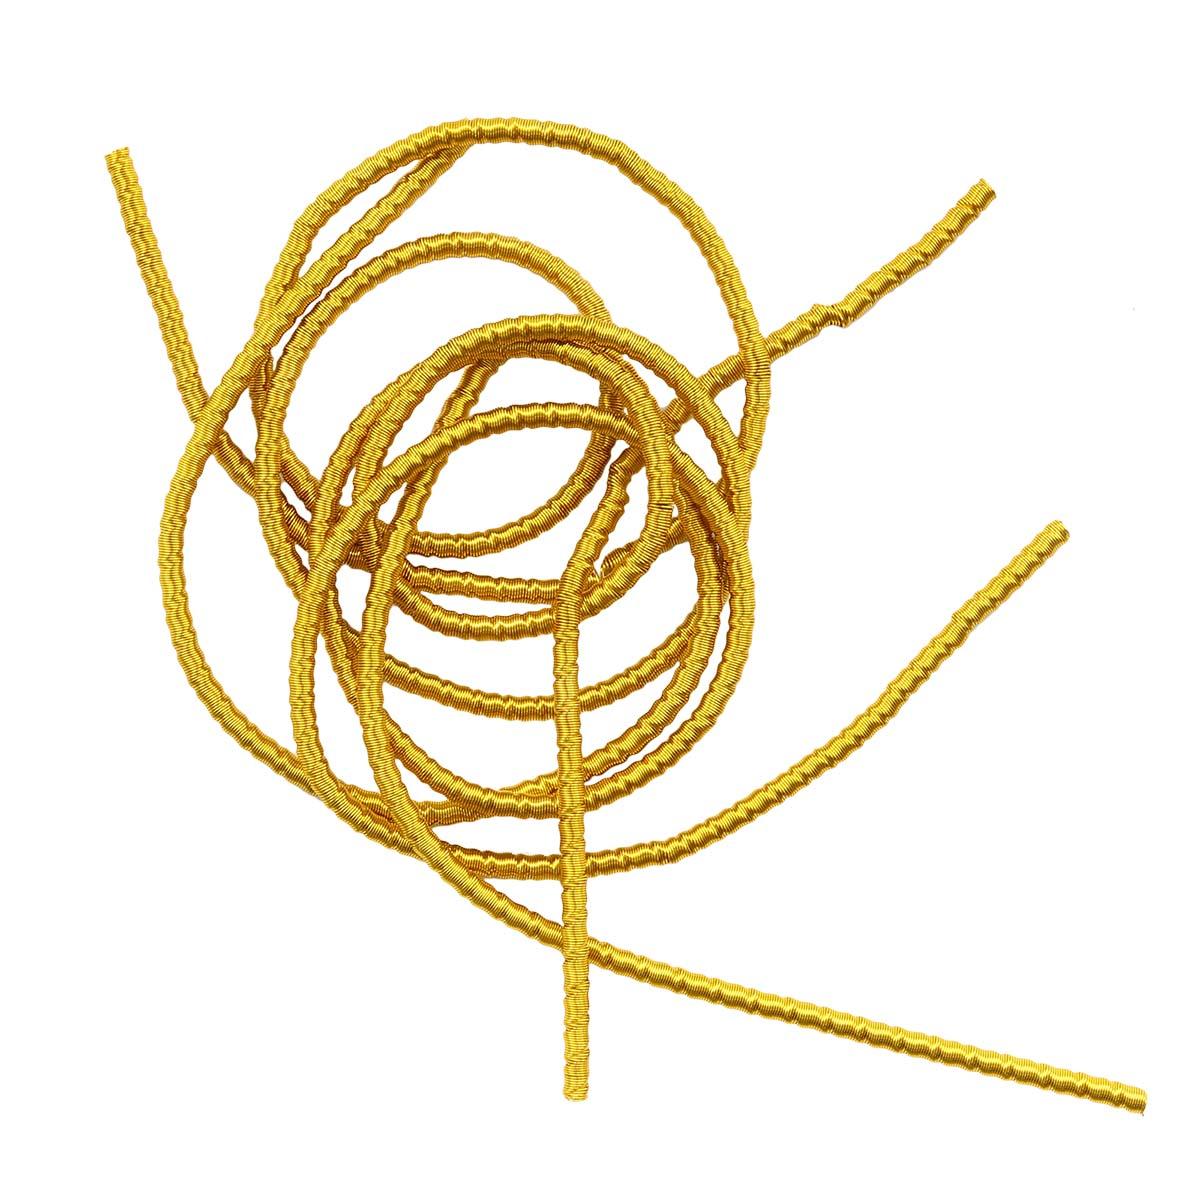 ТБ006НН2 Трунцал бамбук Желтый 2 мм 5 гр. +/- 0,1 гр.